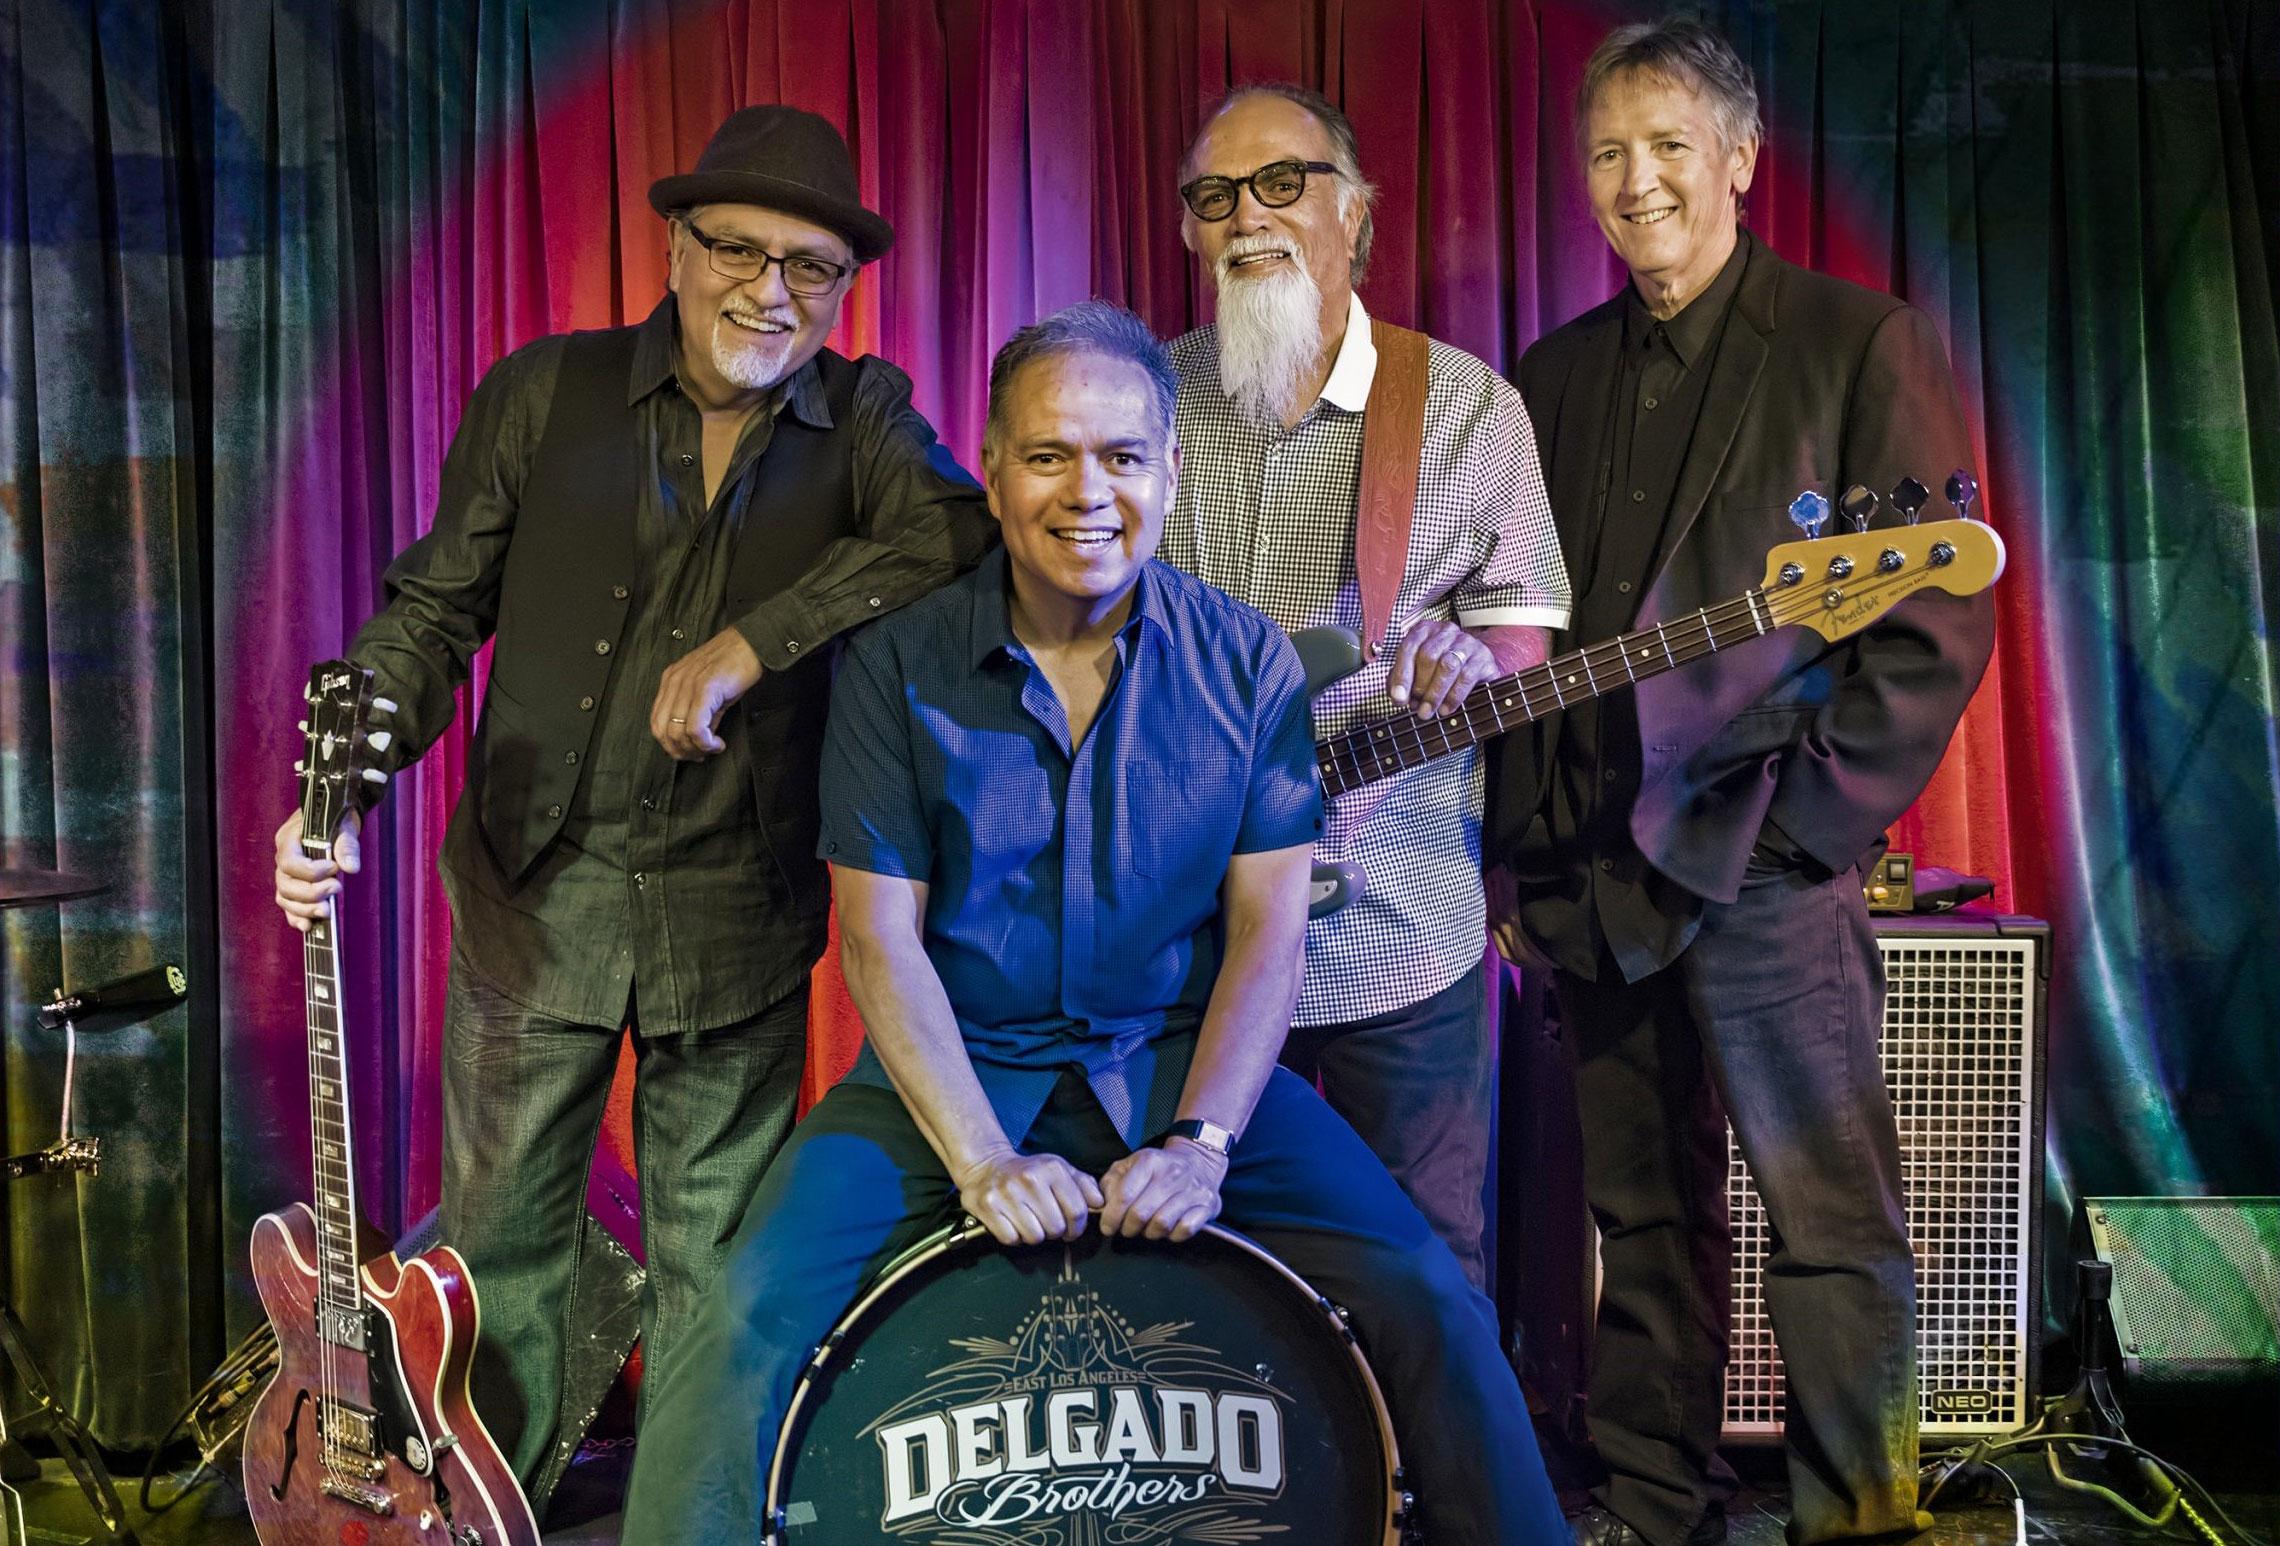 The Delgado Brothers